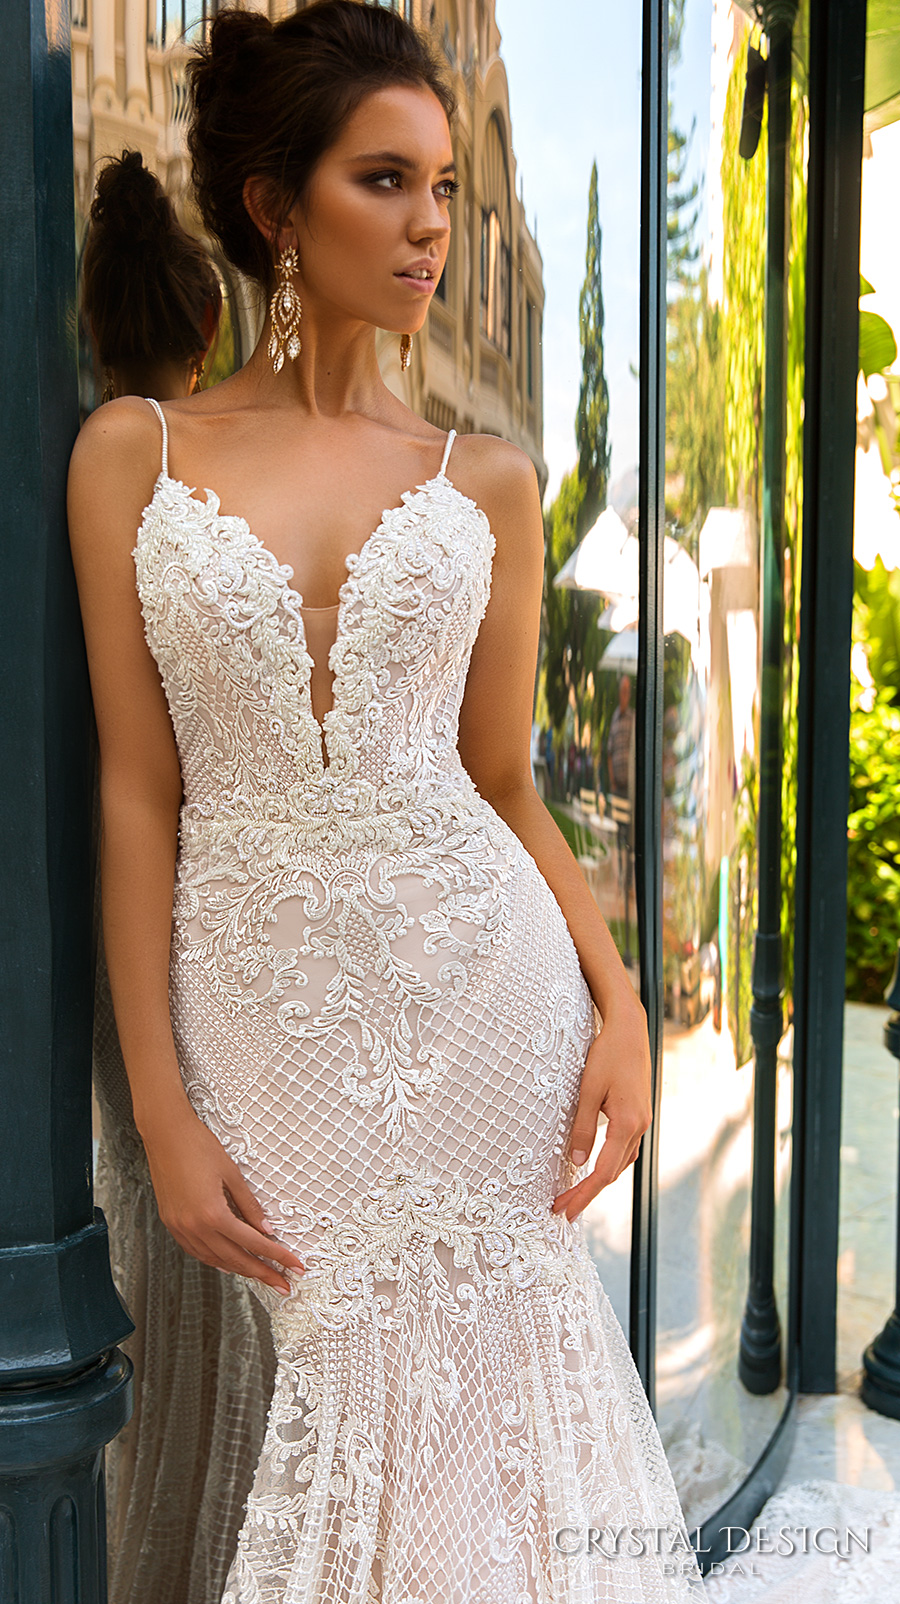 crystal design 2017 bridal sleeveless spagetti strap deep plunging v neck full embellishment elegant sexy fit and flare wedding dress low back chapel train (11 fler) zv